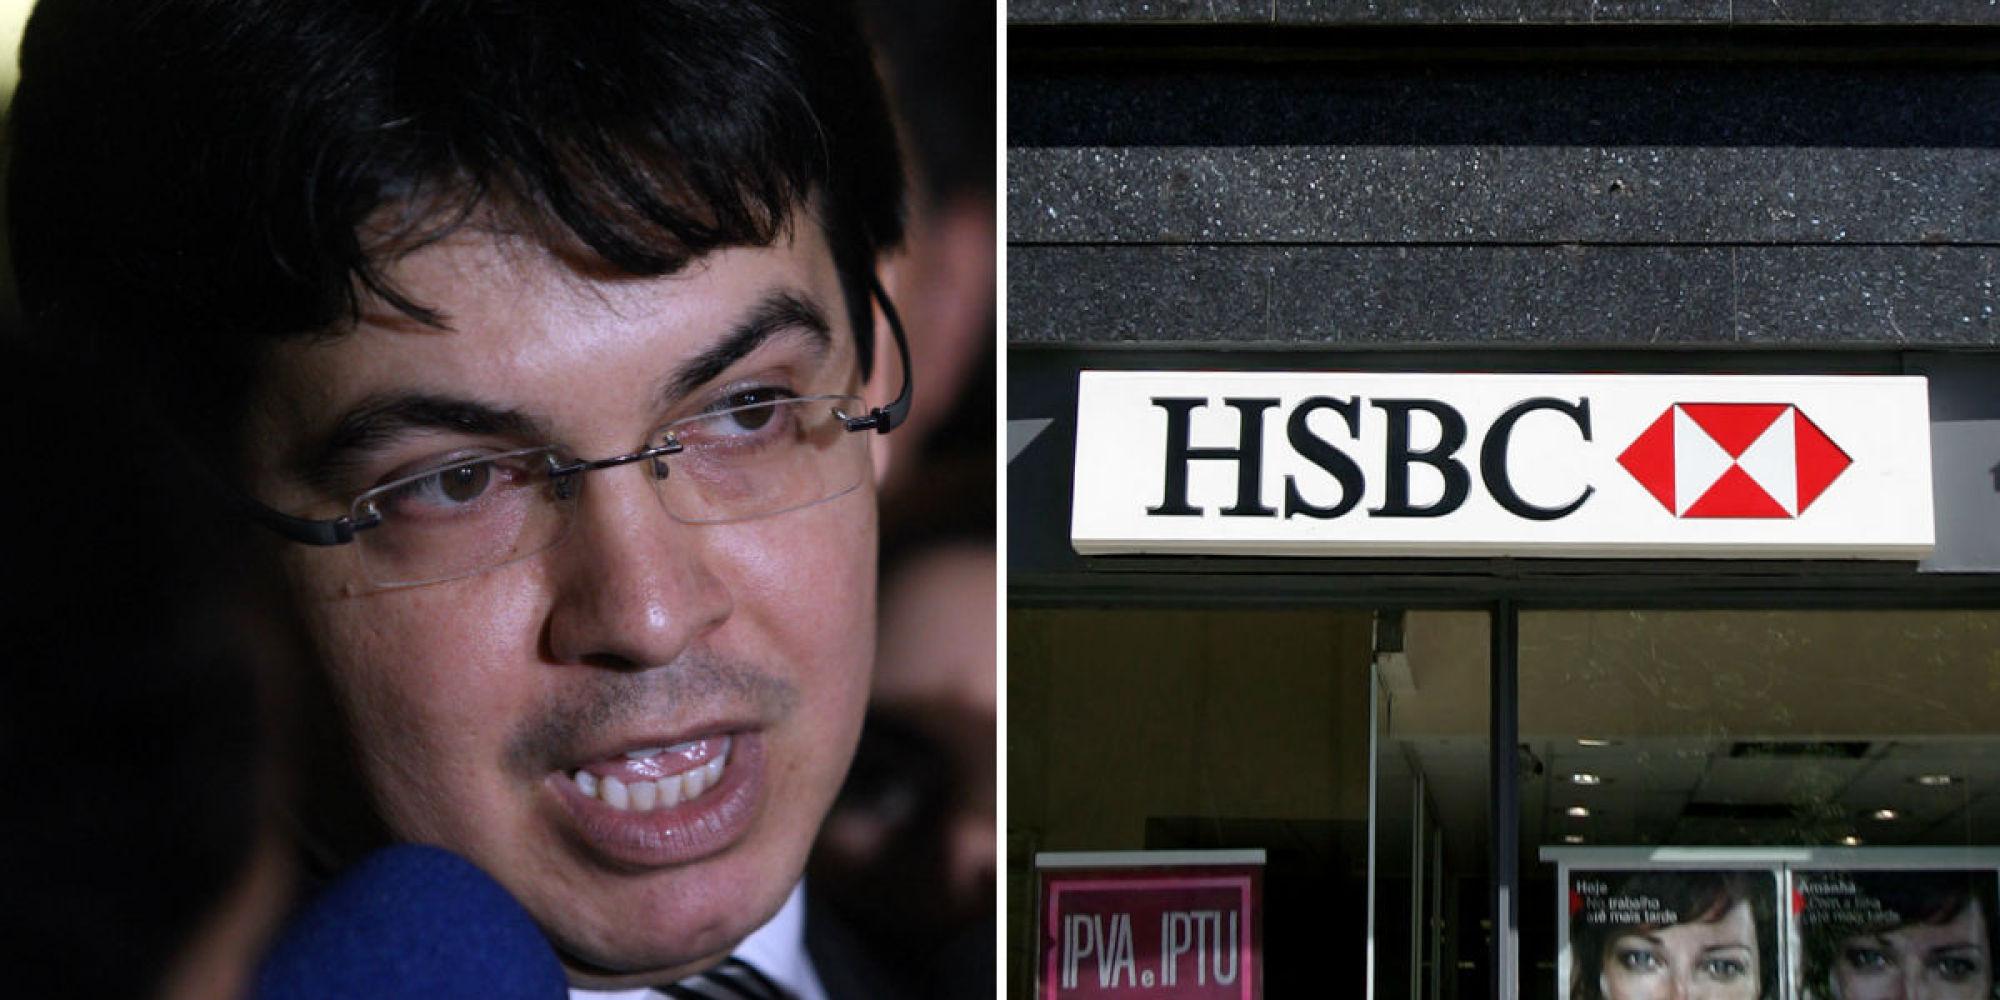 Senado instala CPI do HSBC